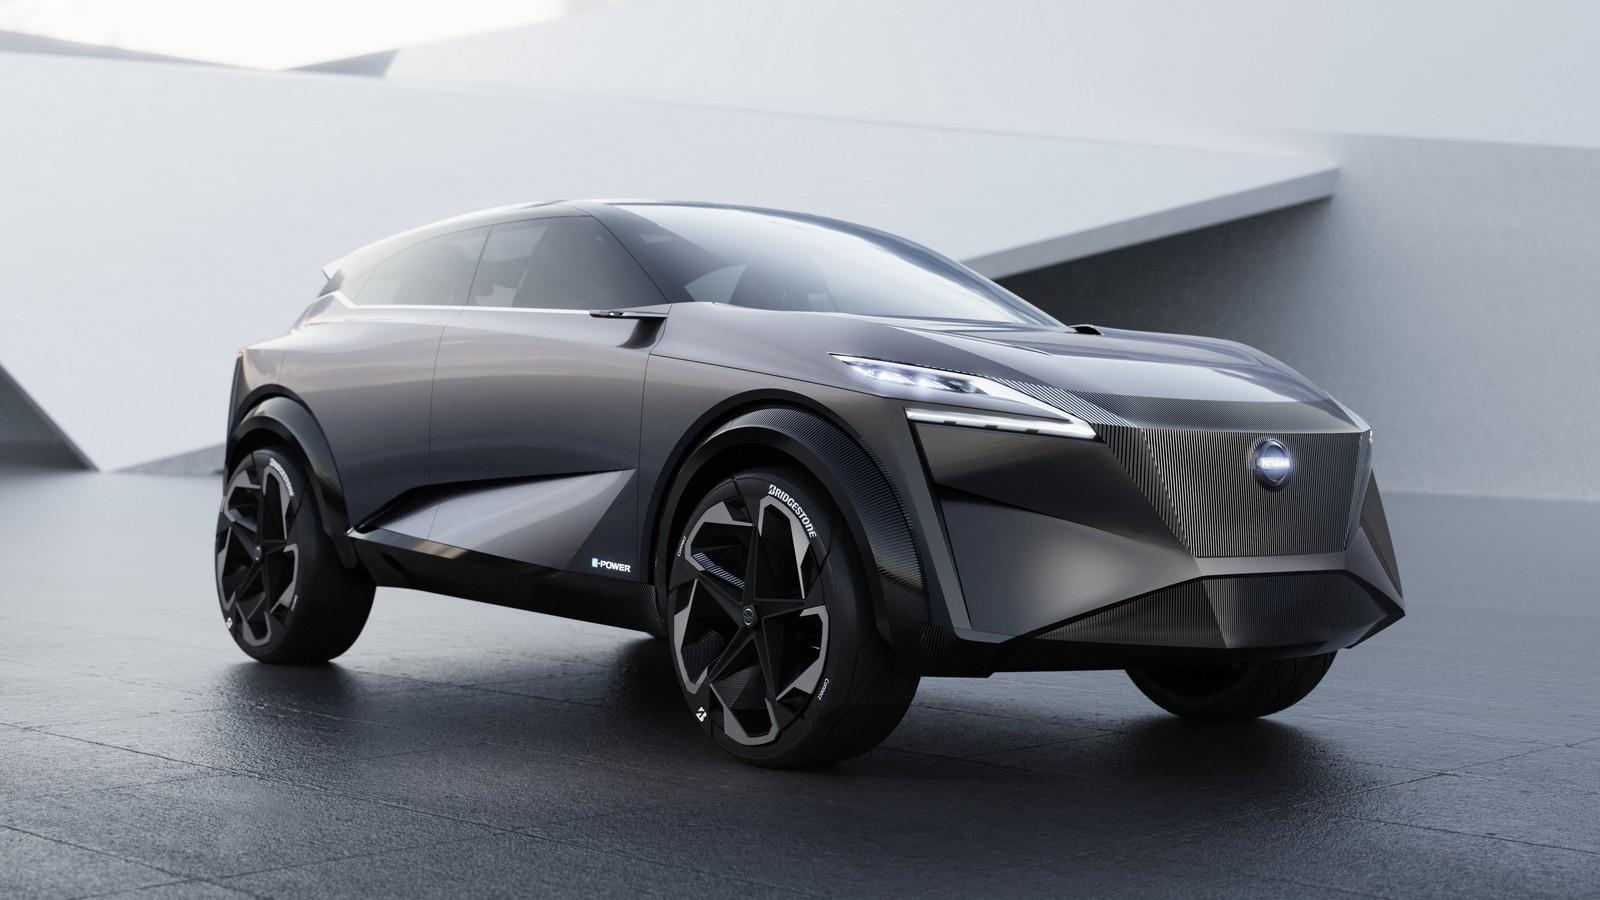 Nissan Imq Concept Car Ginebra (1)